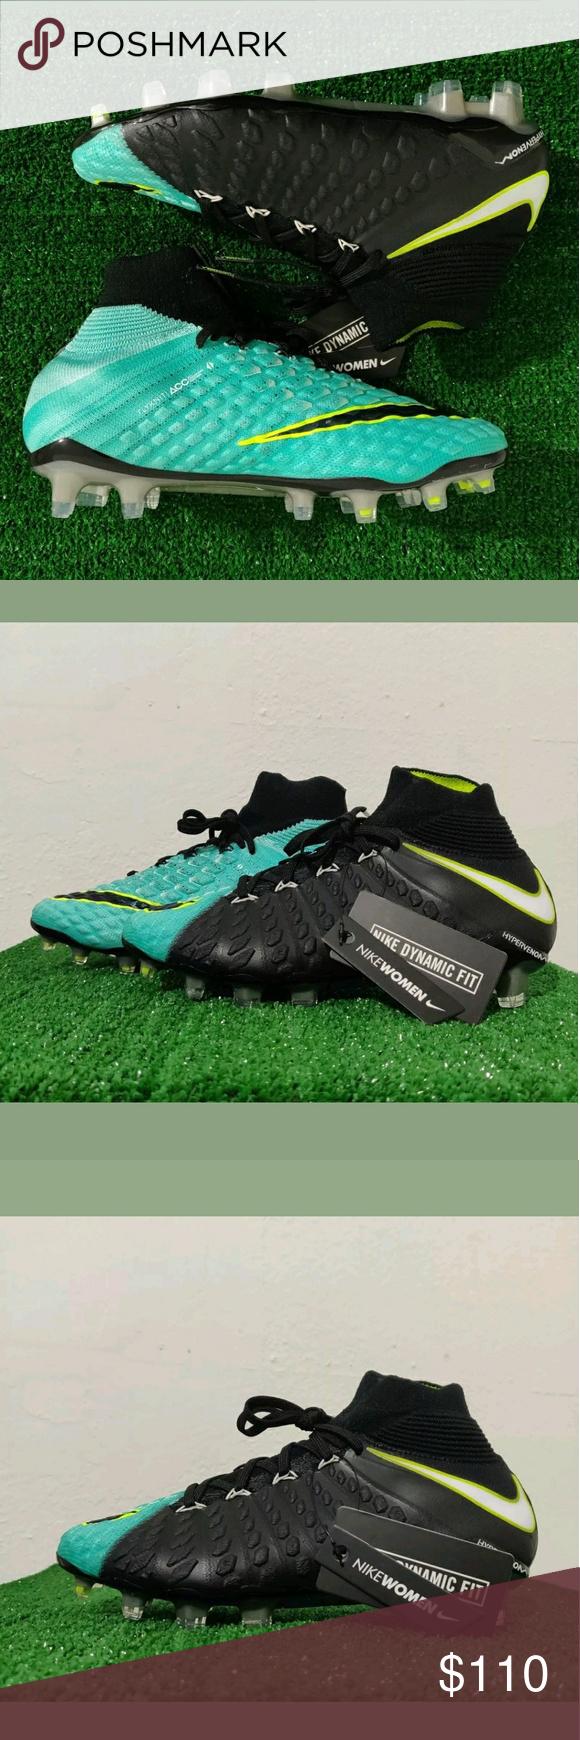 c6635a7903c8 Women's Nike Hypervenom Phantom 3 Soccer Cleats Brand New Without Box  Women's Nike Hypervenom Phantom 3 DF FG 881545-400 Aqua/Black Soccer Cleats  US 7.